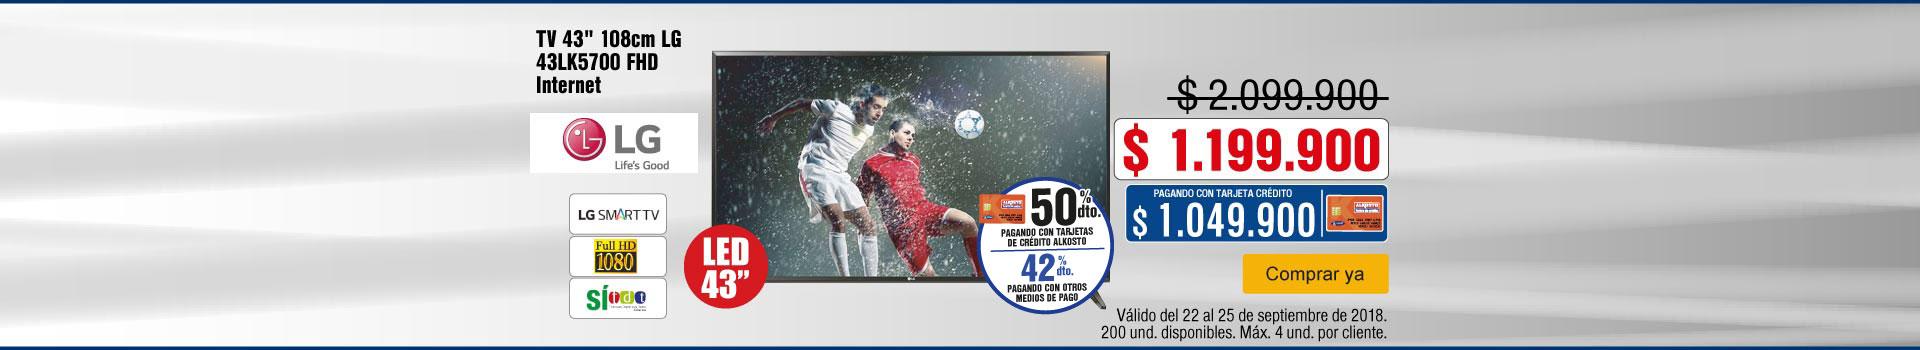 AK-KT-BCAT-3-TV-PP---Samsung-43LK5700-Sep21